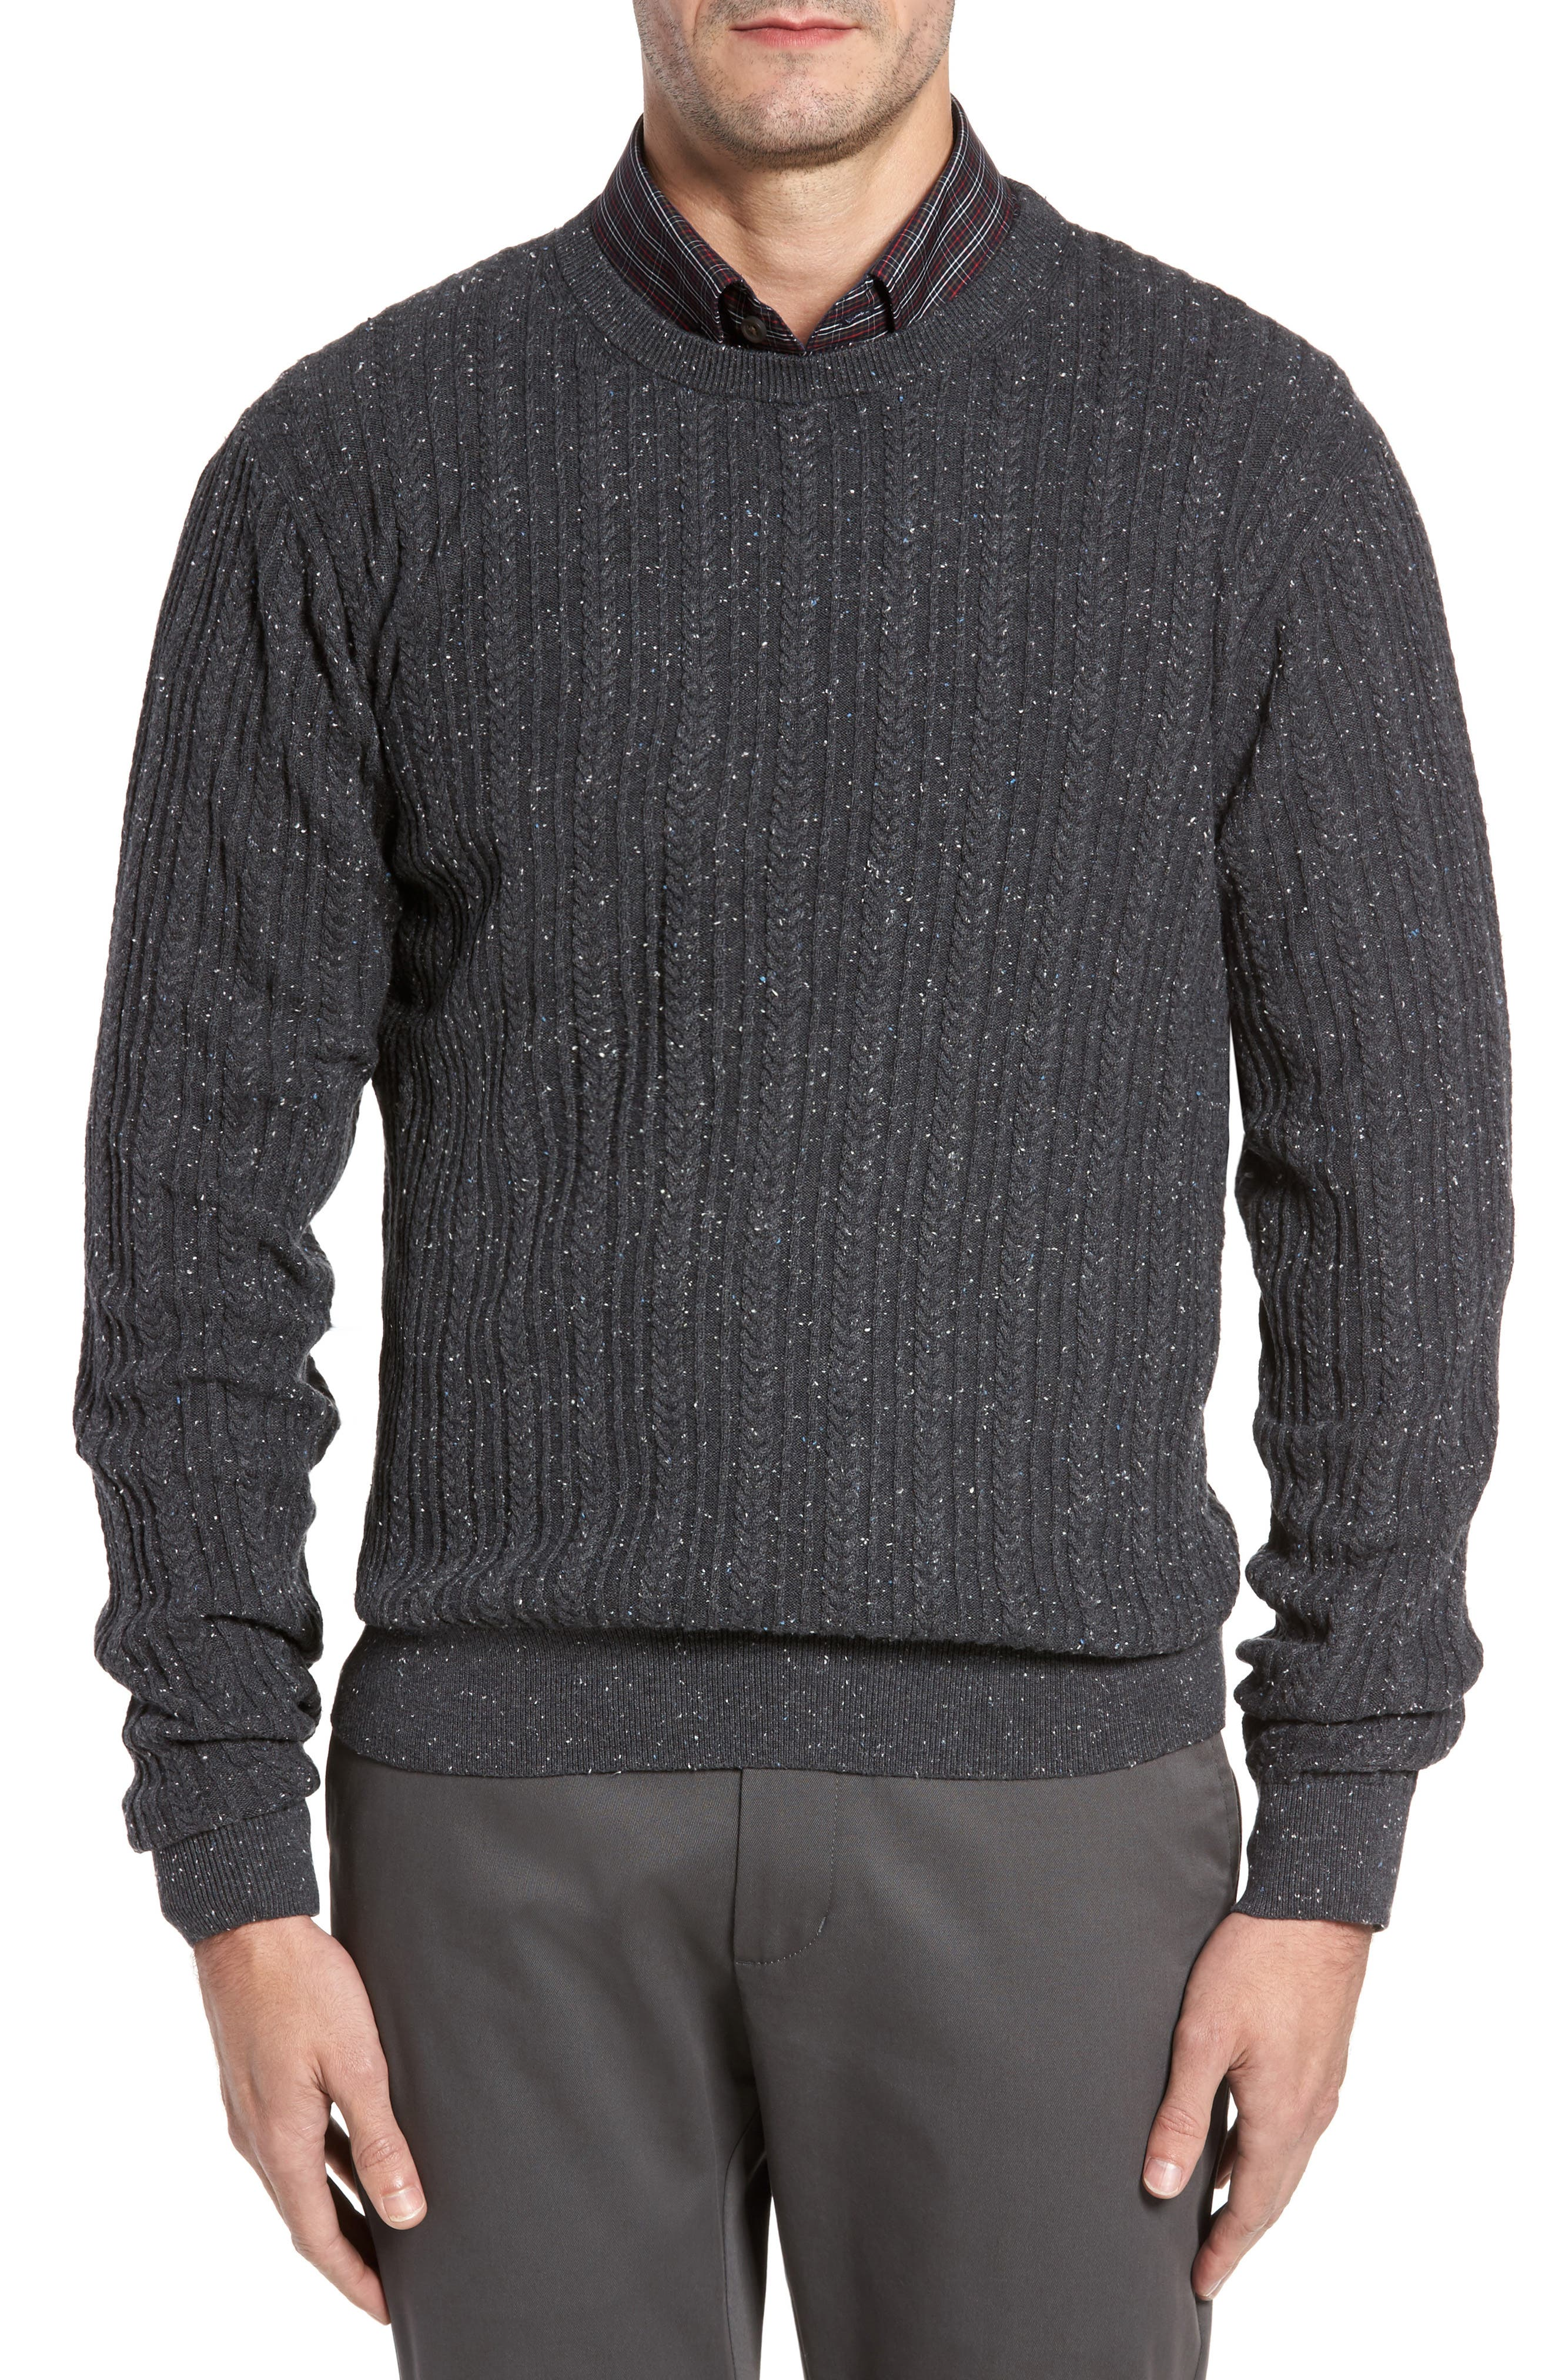 Alternate Image 1 Selected - Cutter & Buck Carlton Crewneck Sweater